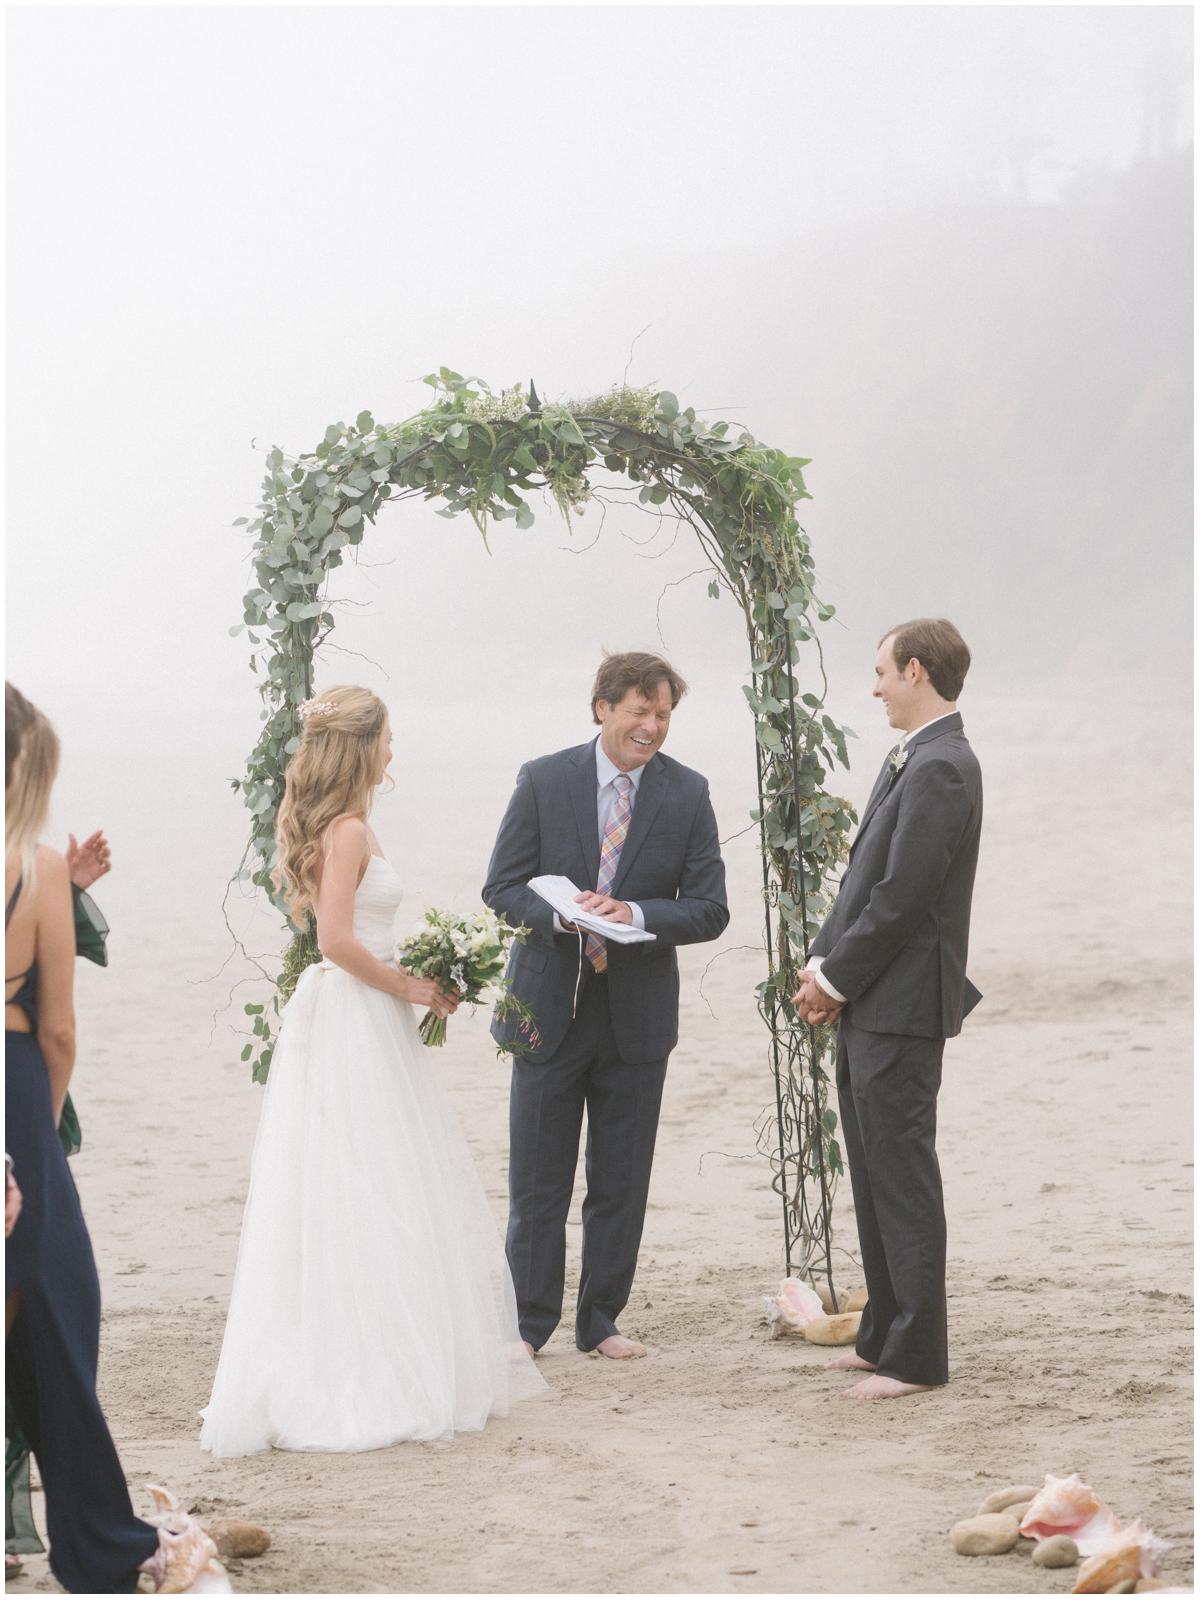 Santa Babara Elopement Wedding Photographer - Pinnel Photography-01-06.jpg